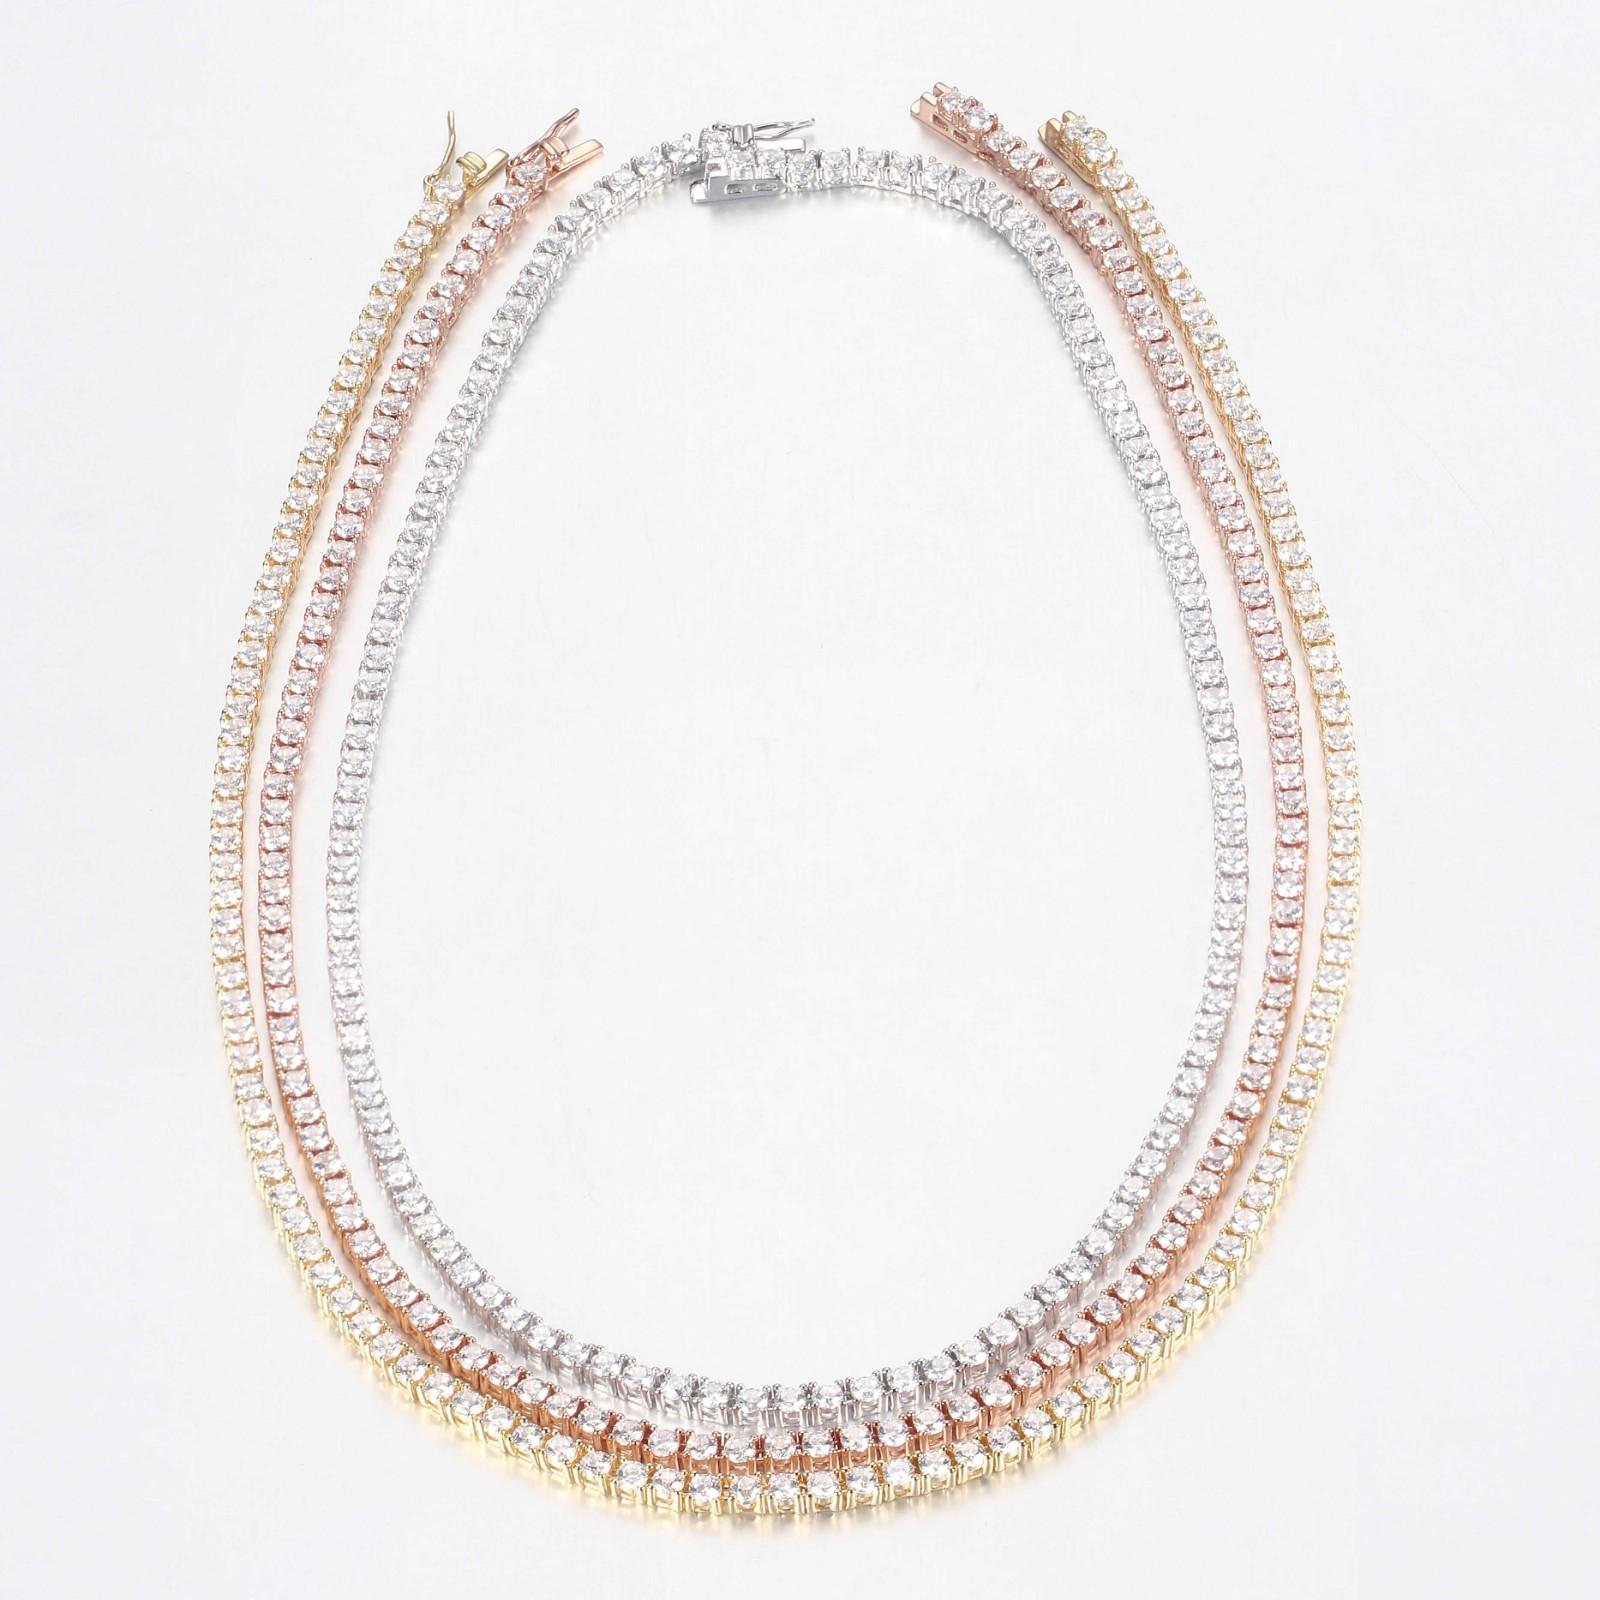 Kirin Jewelry -Sterling Silver Pendants, 925 Sterling Silver Cz Cubic Zirconia Chain